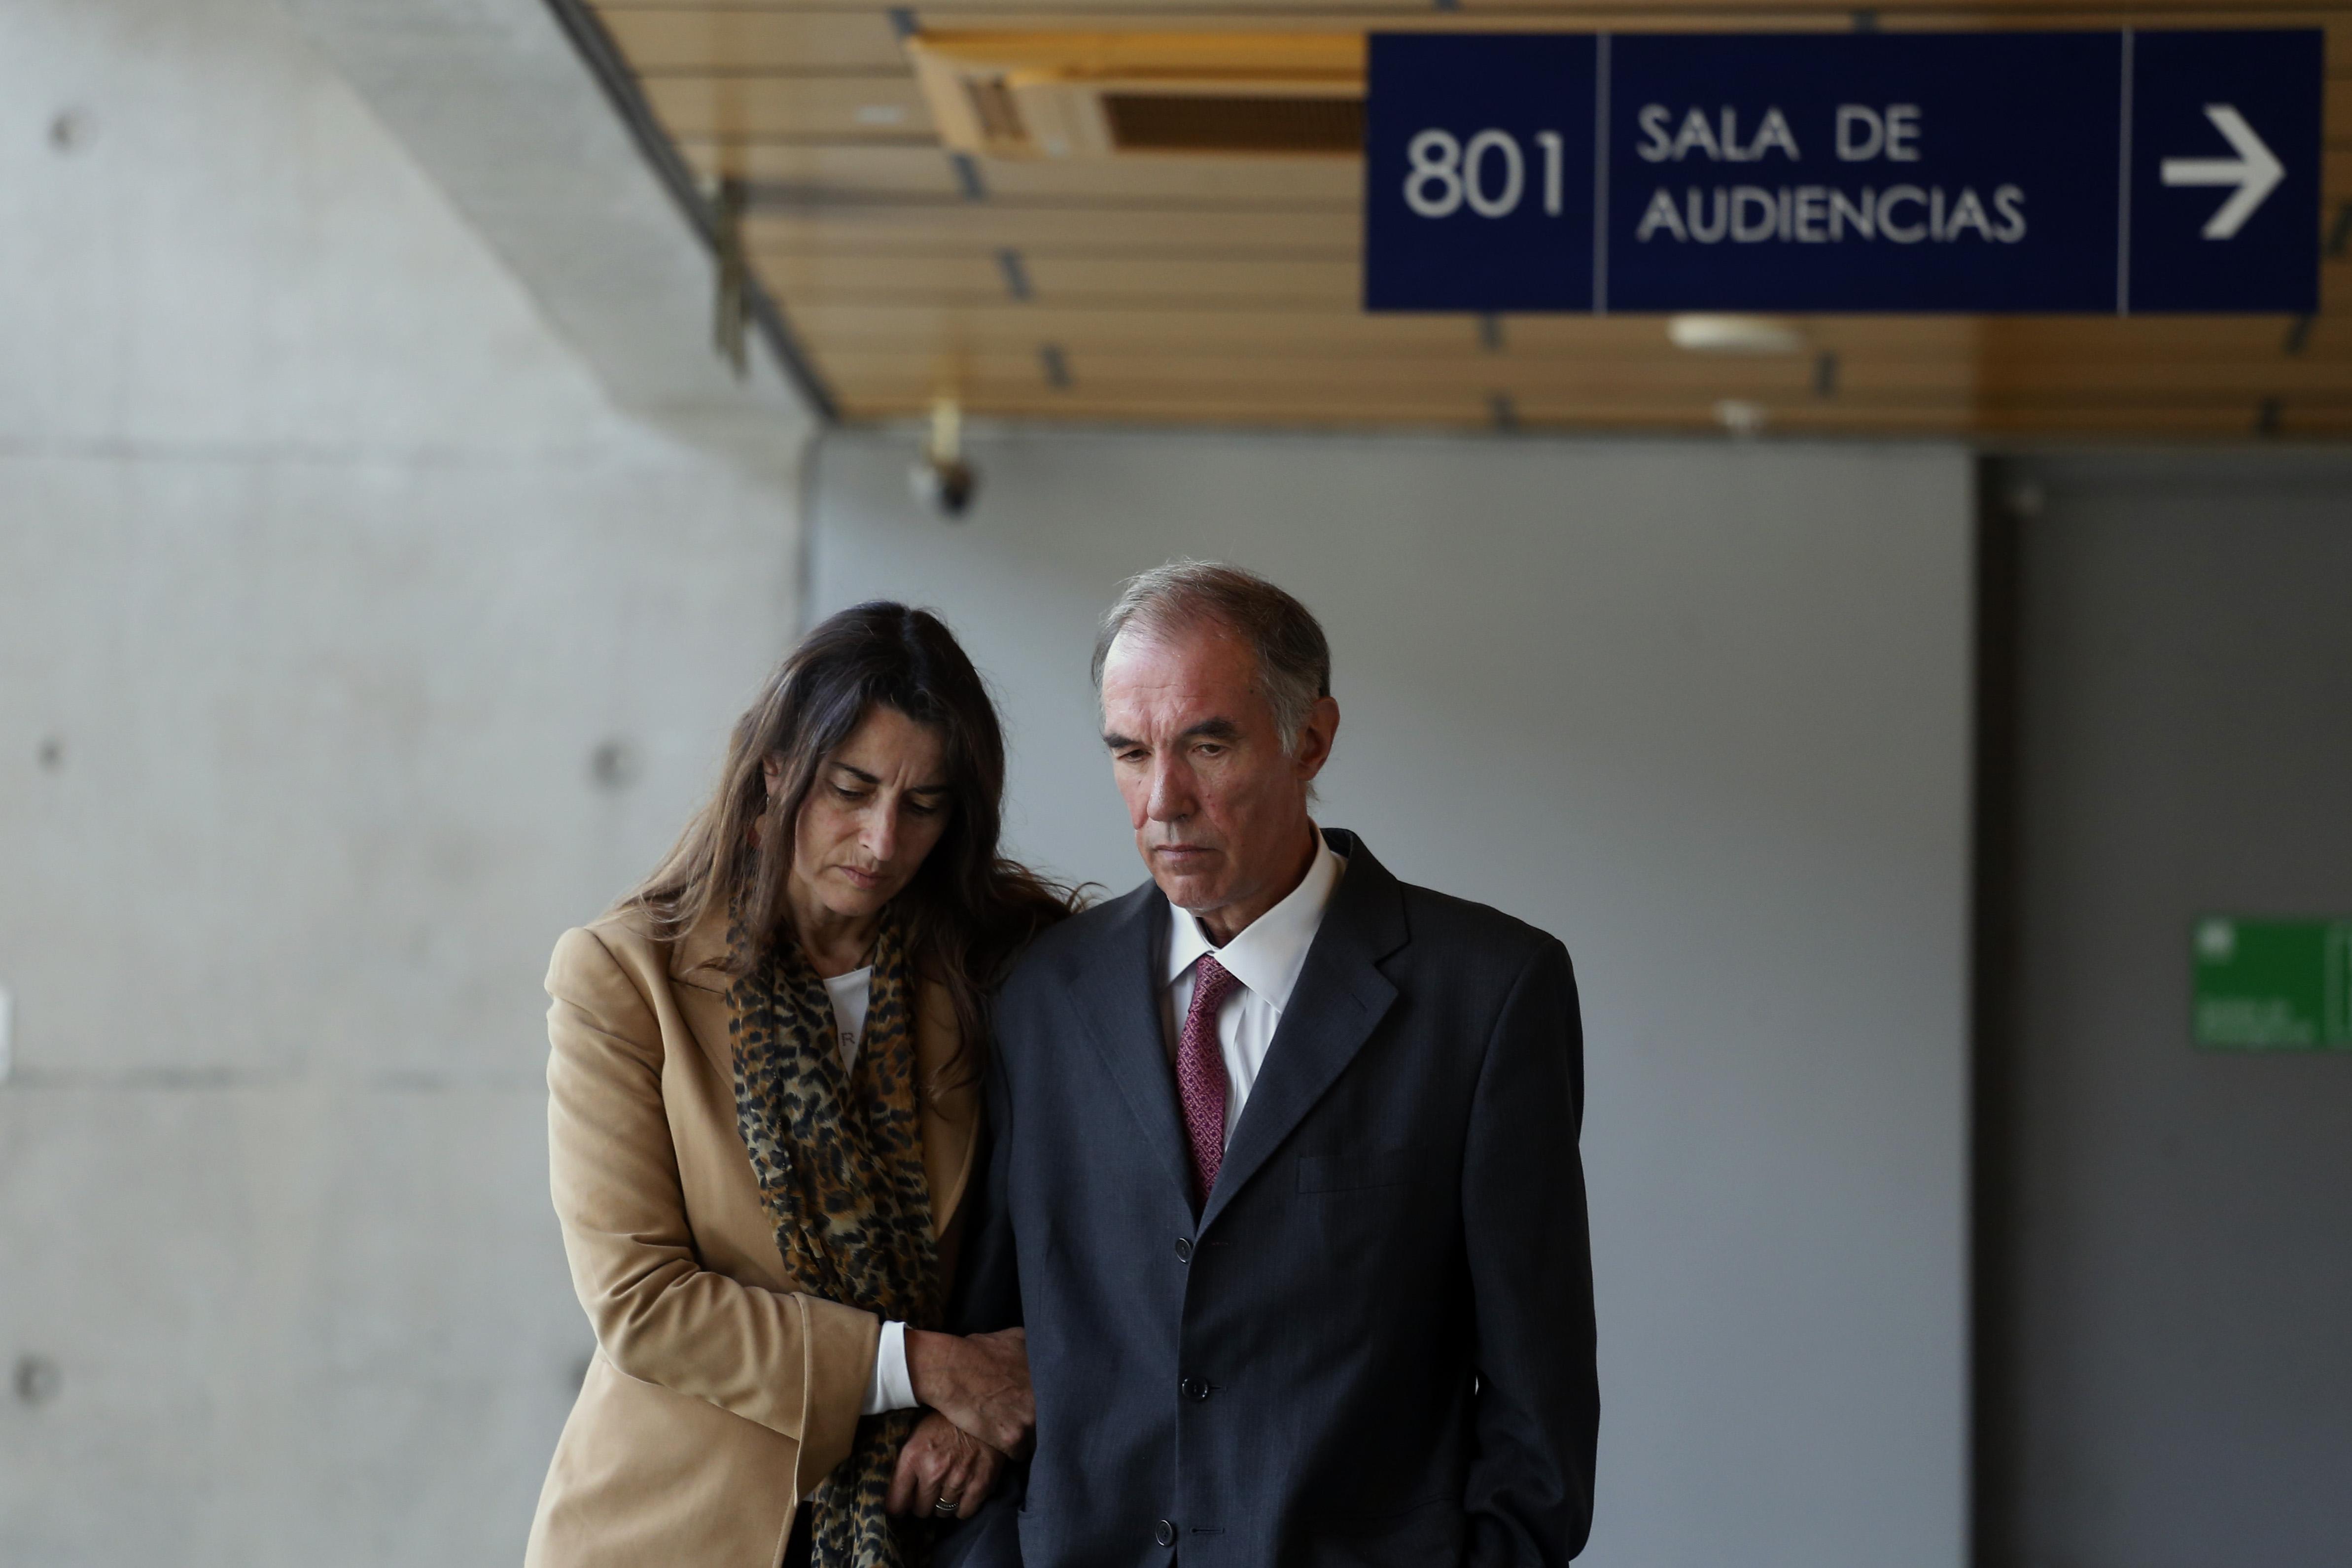 Exsenador Jaime Orpis junto a su esposa Ana Luisa Jouanne. Pablo Vera Lisperguer | Agencia UNO